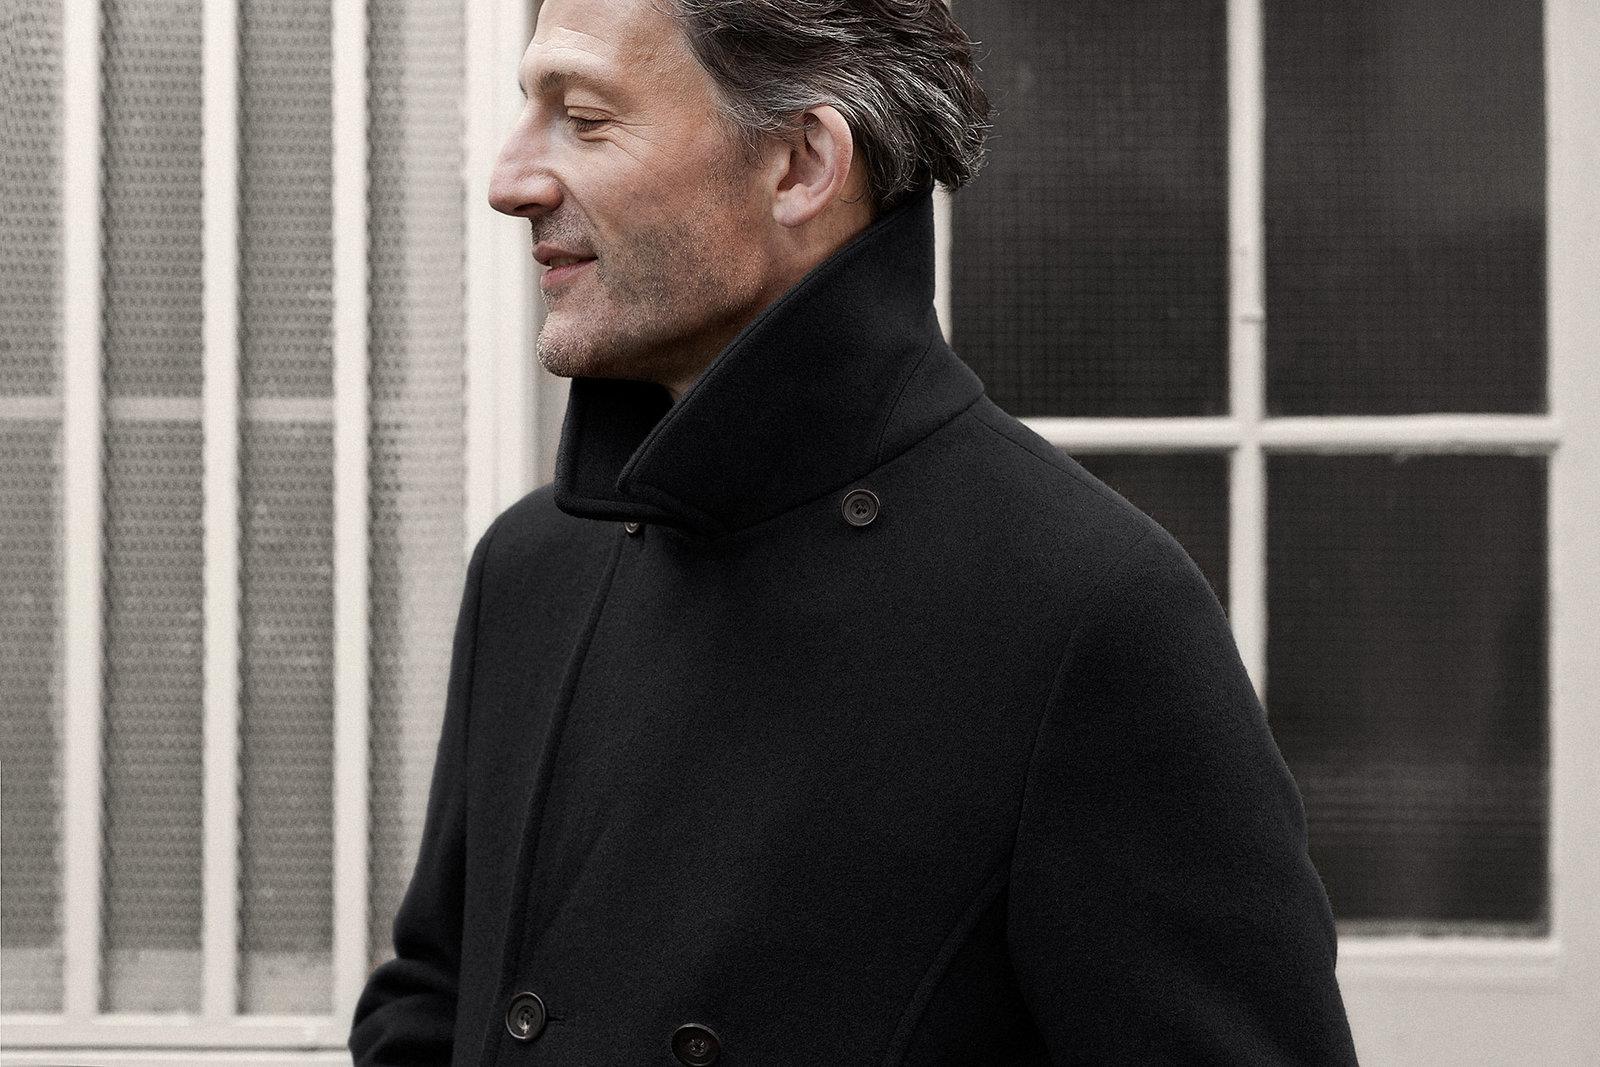 peacoat-uniform-melton-black-worn-3@2x.jpg